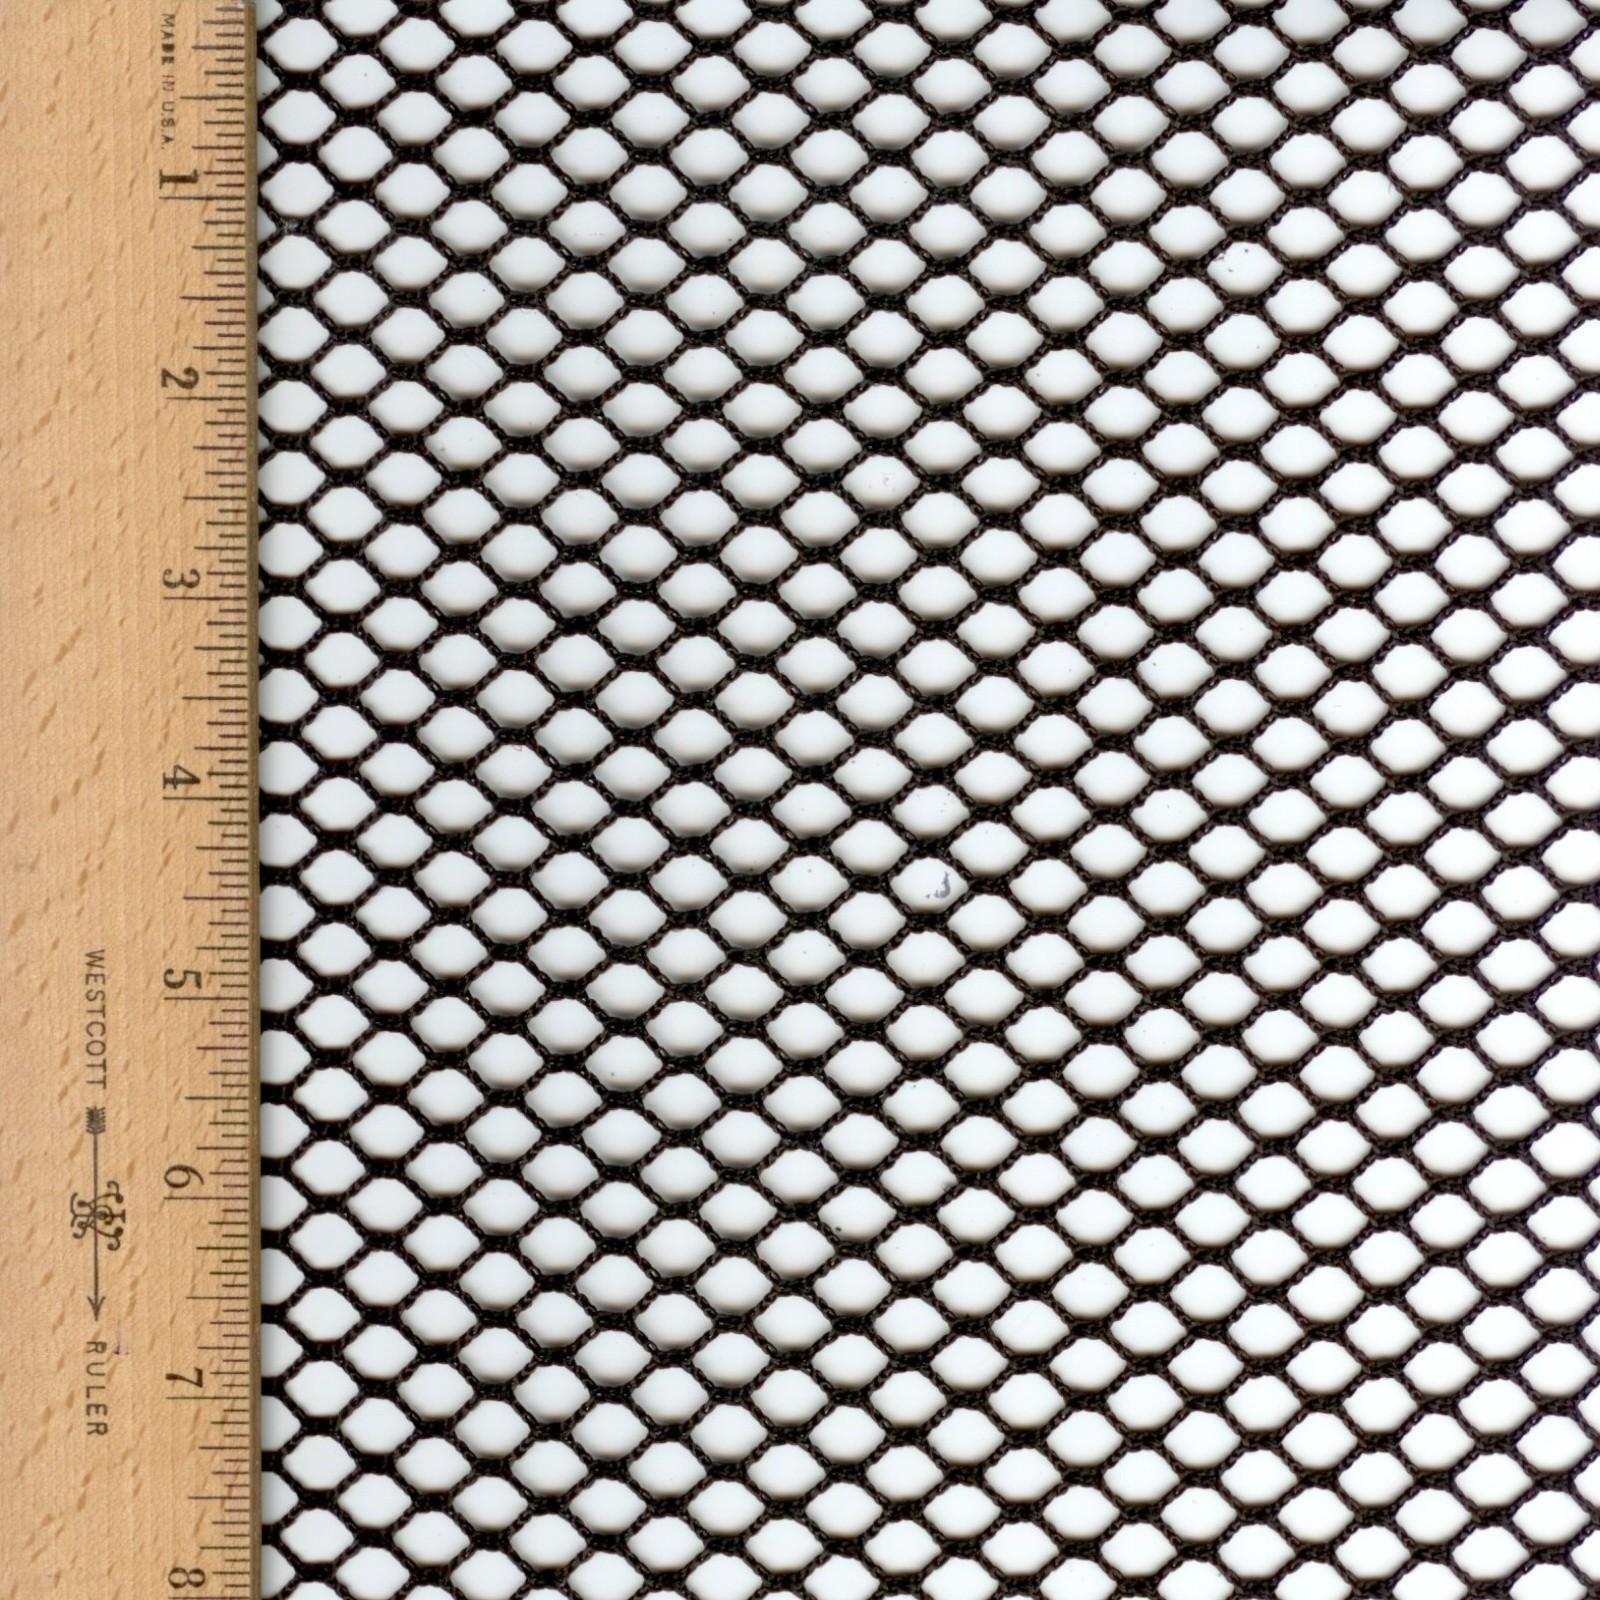 Higgins materials nylon netting shipping